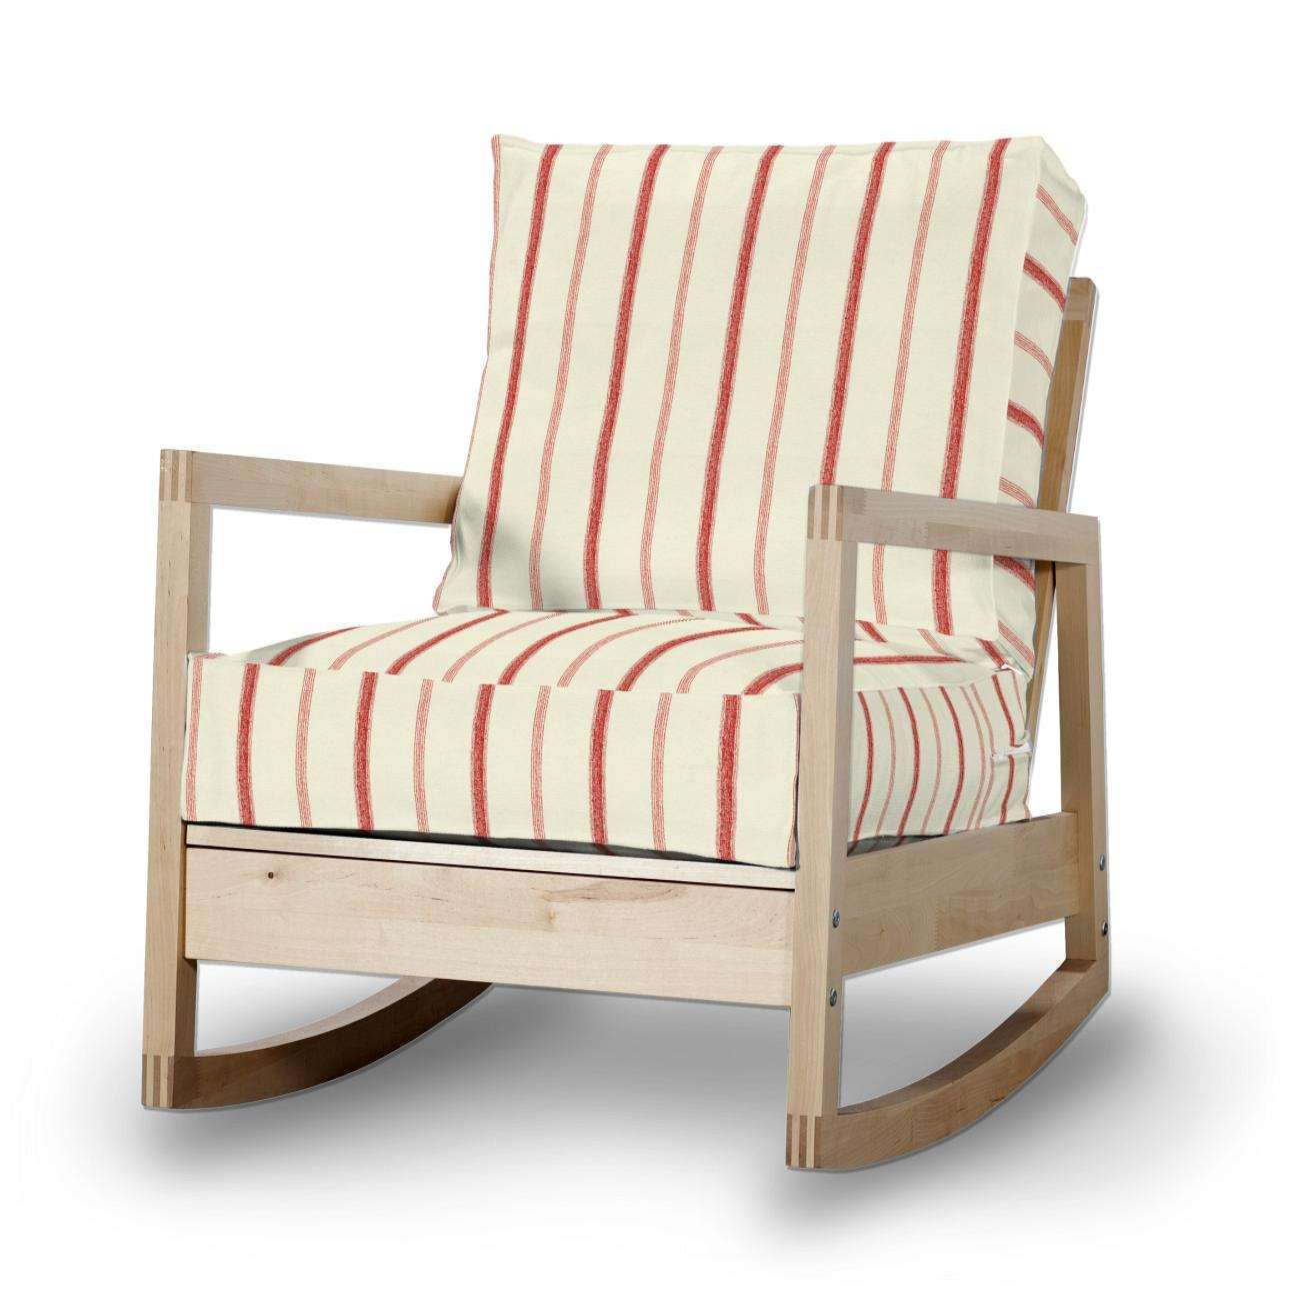 Pokrowiec na fotel Lillberg Fotel Lillberg w kolekcji Avinon, tkanina: 129-15